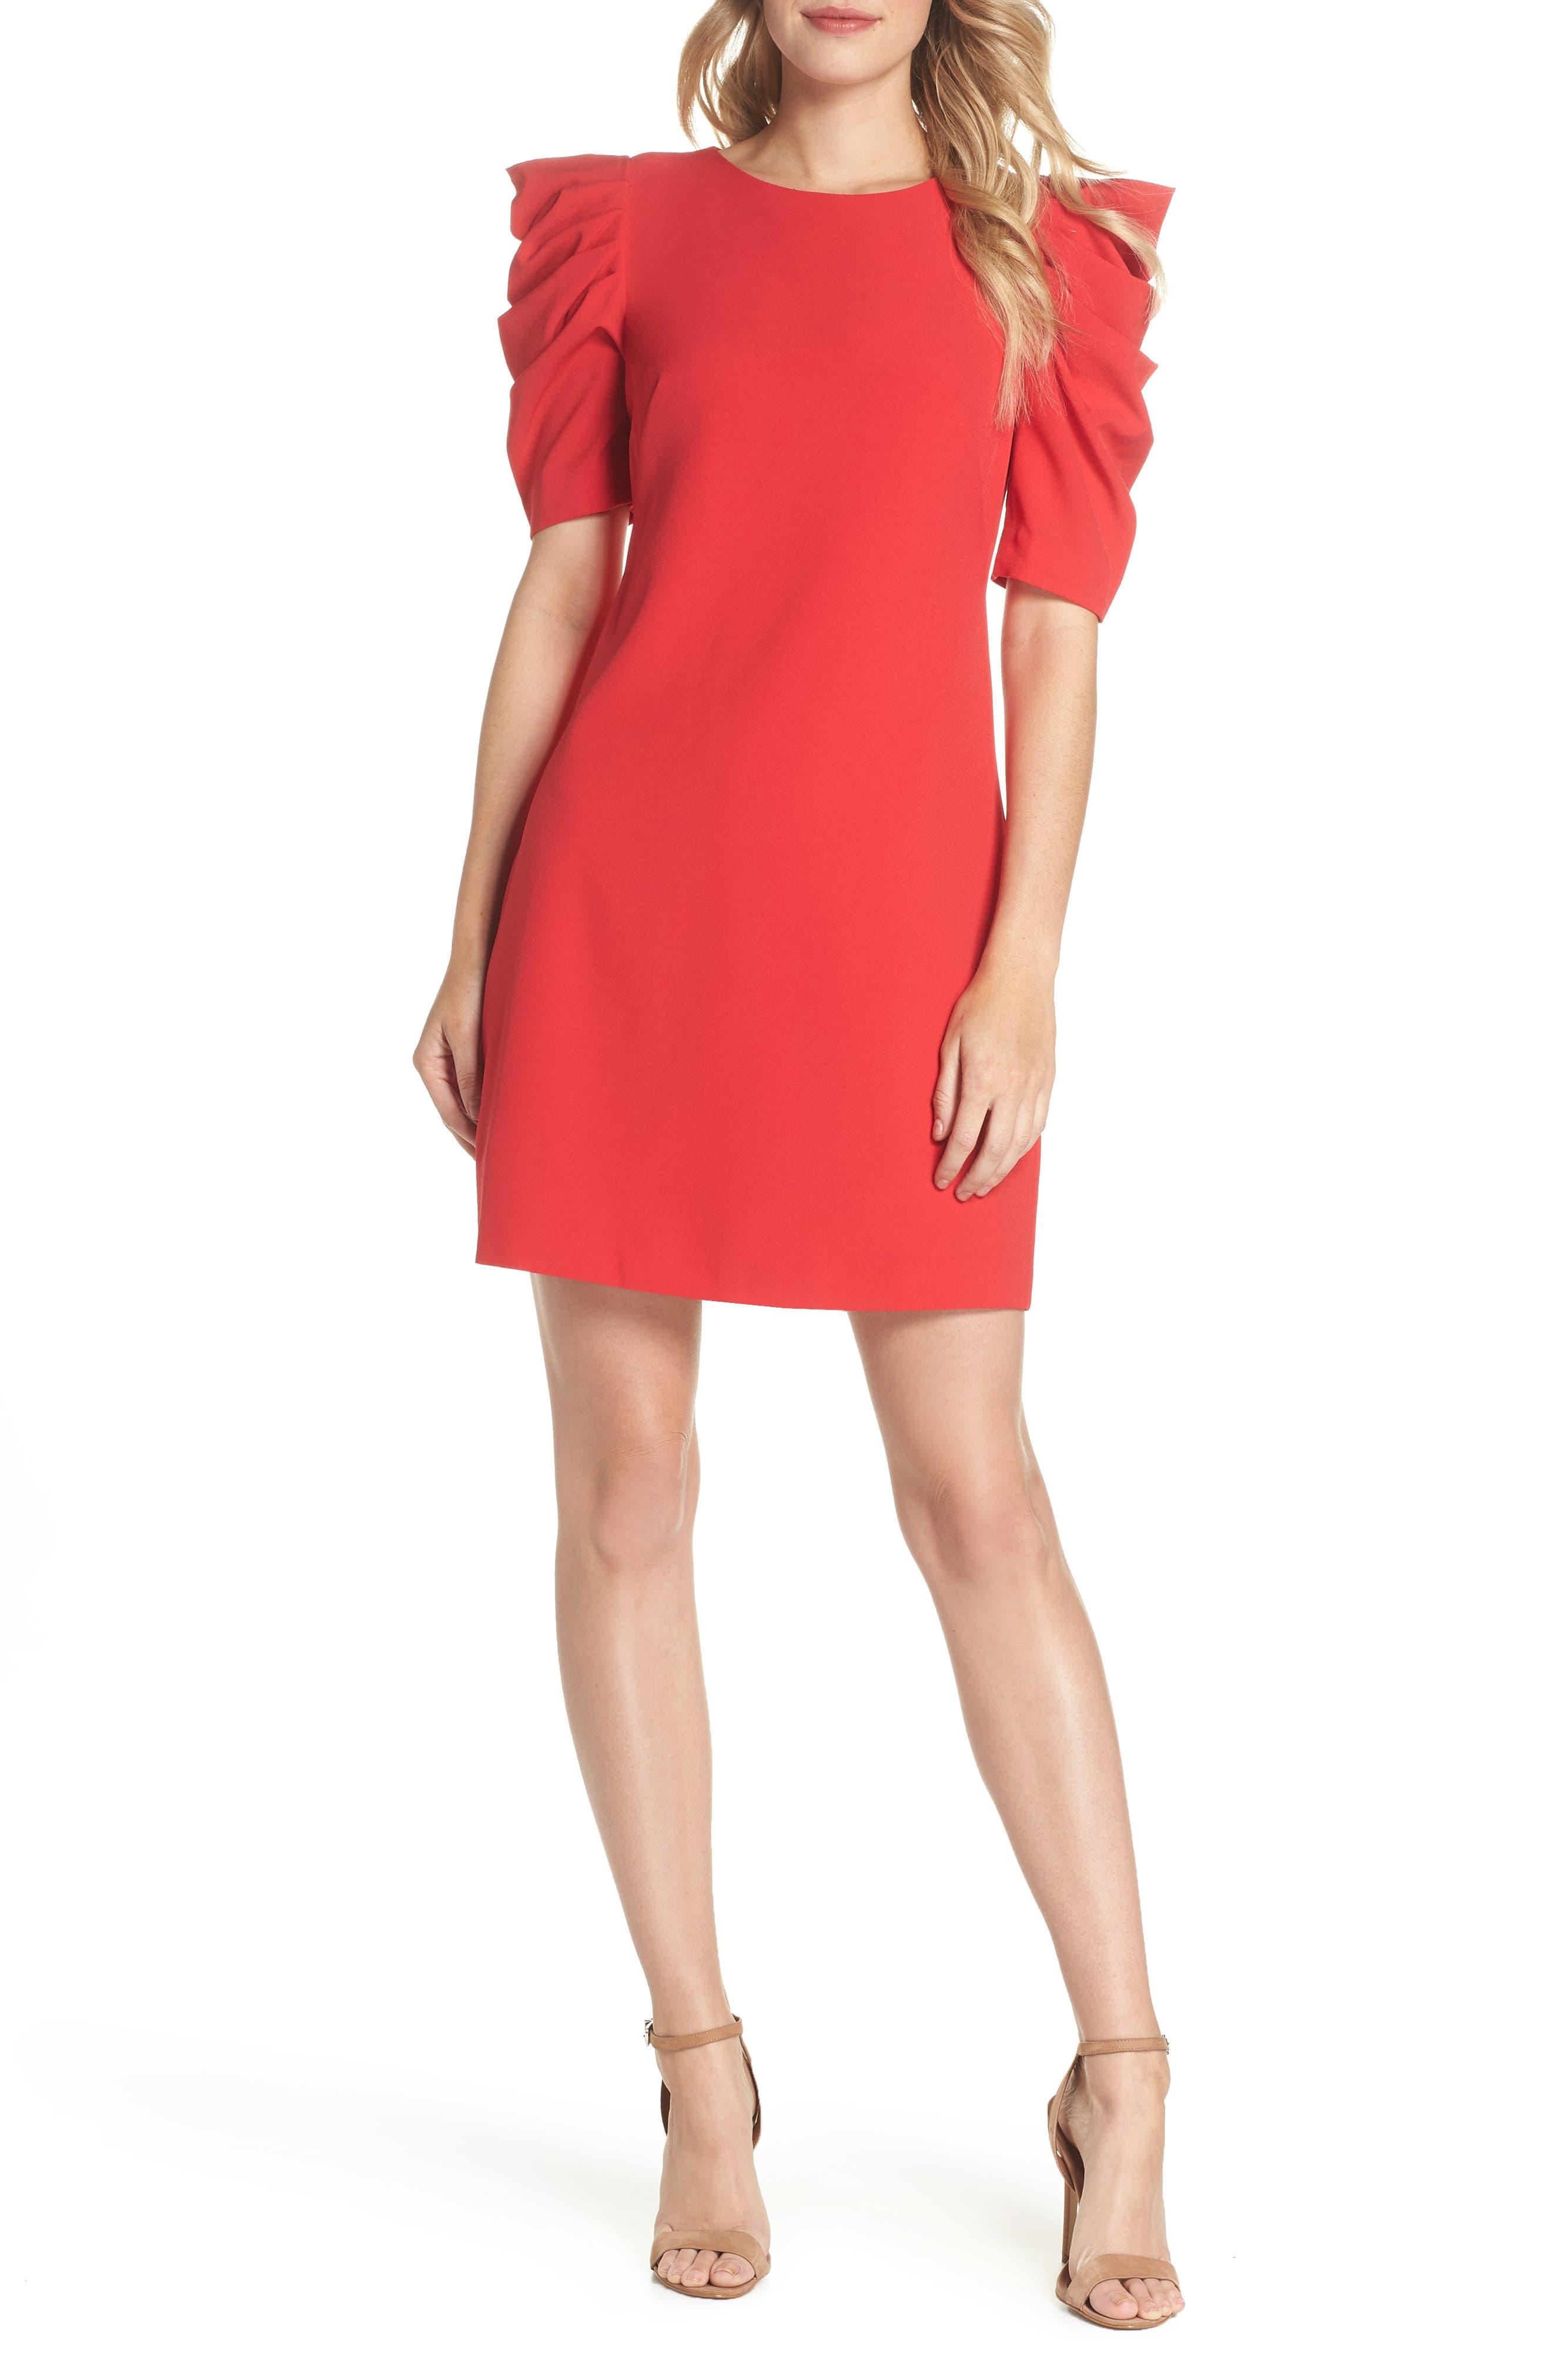 Puff Sleeve Shift Dress,                             Main thumbnail 1, color,                             Red Festive